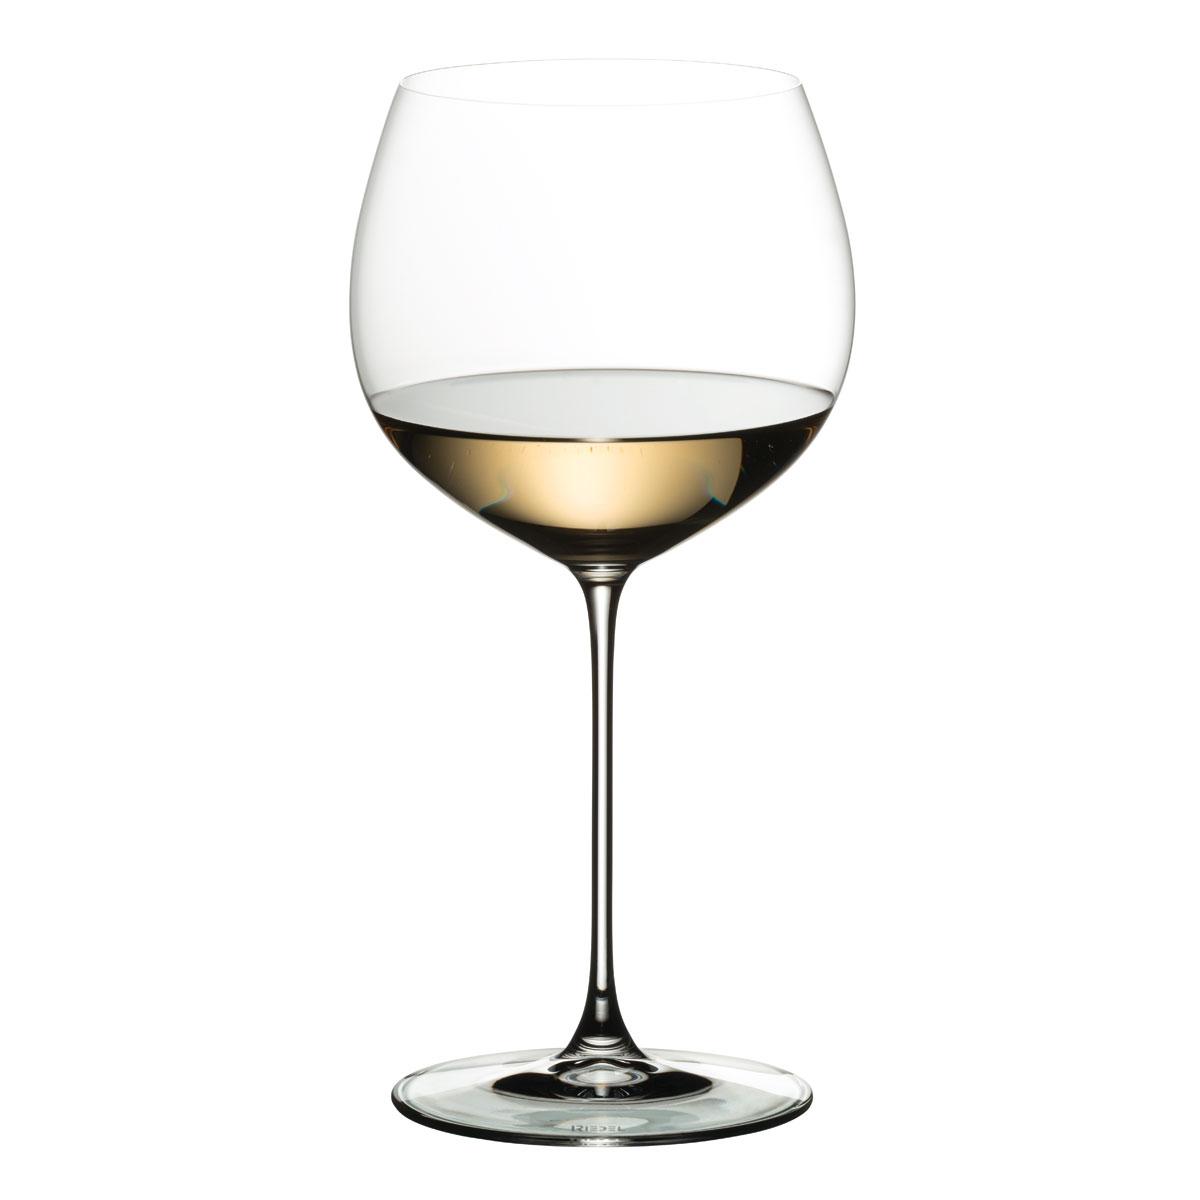 Riedel Veritas, Chardonnay Wine Glass, Single